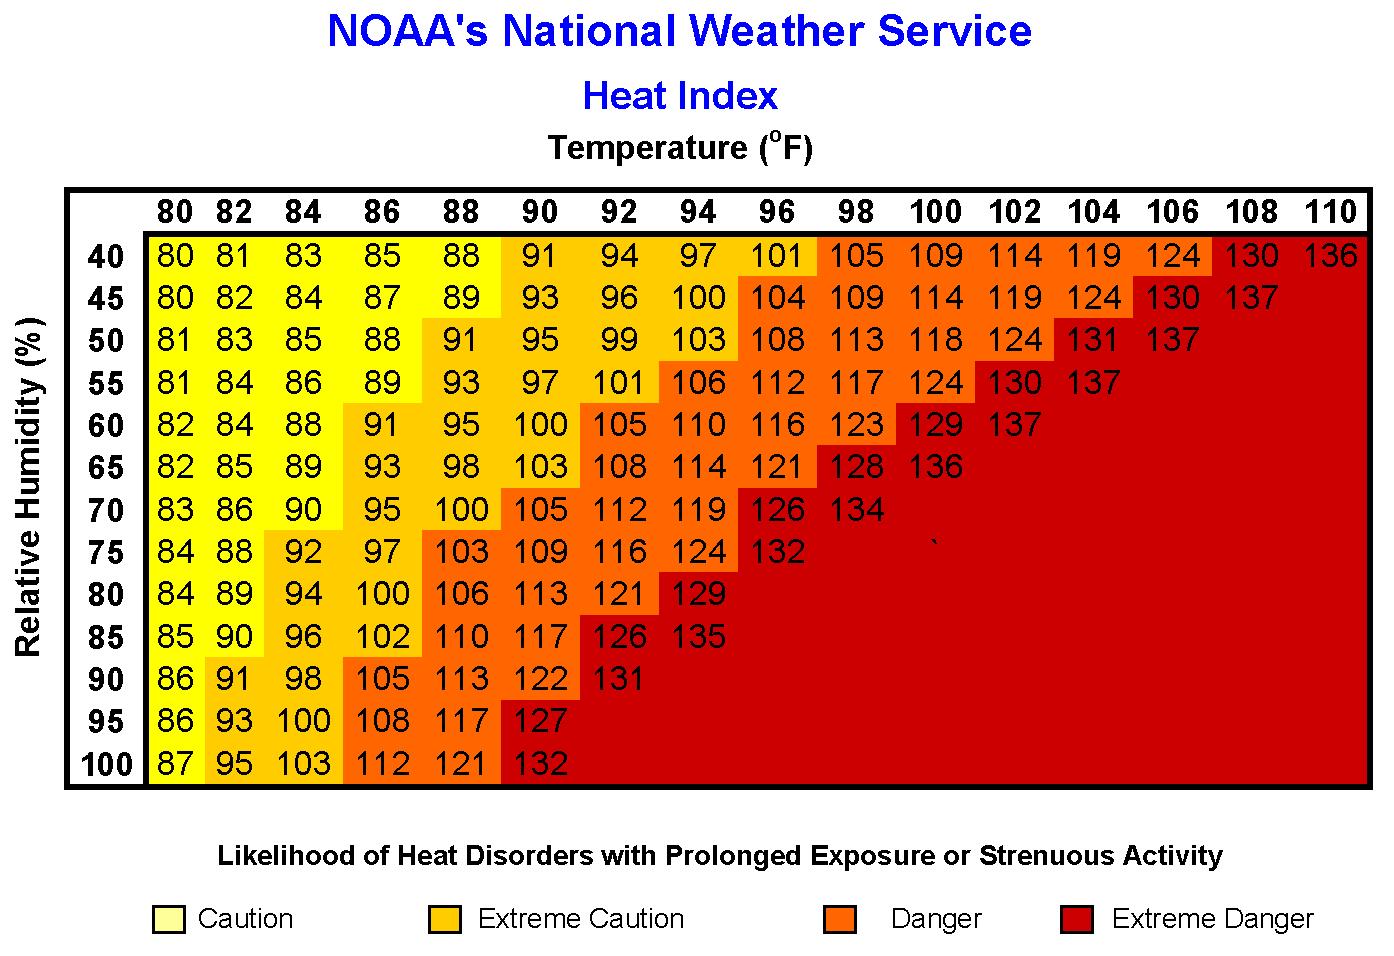 Excessive Heat Conditions